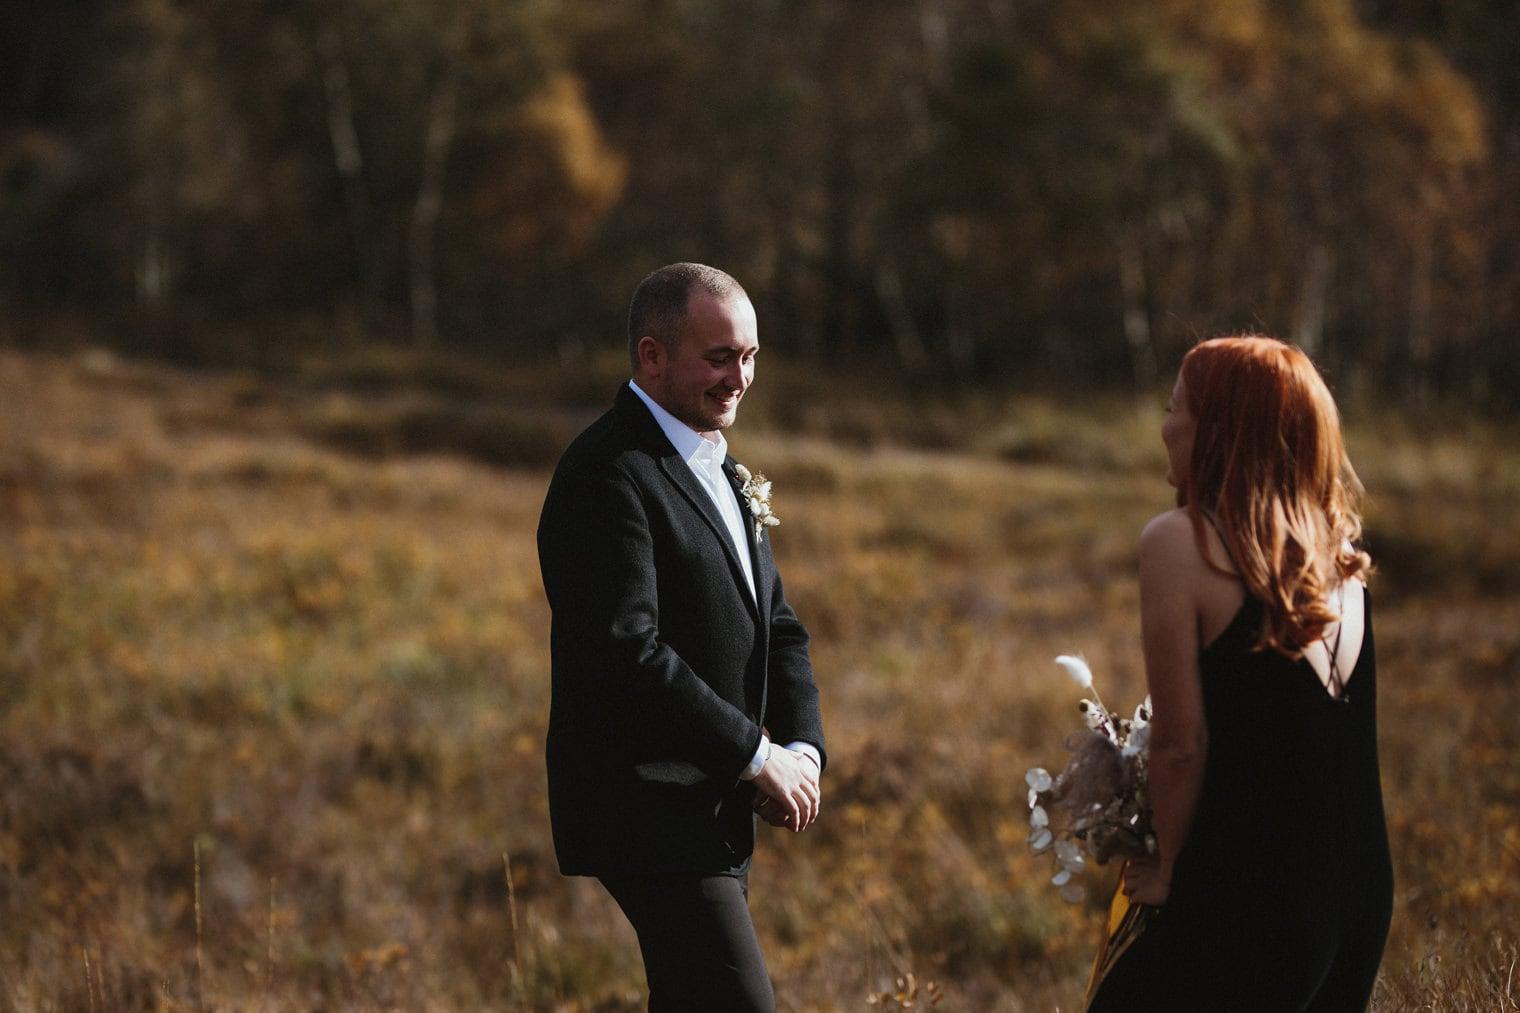 groom takes first look at bride